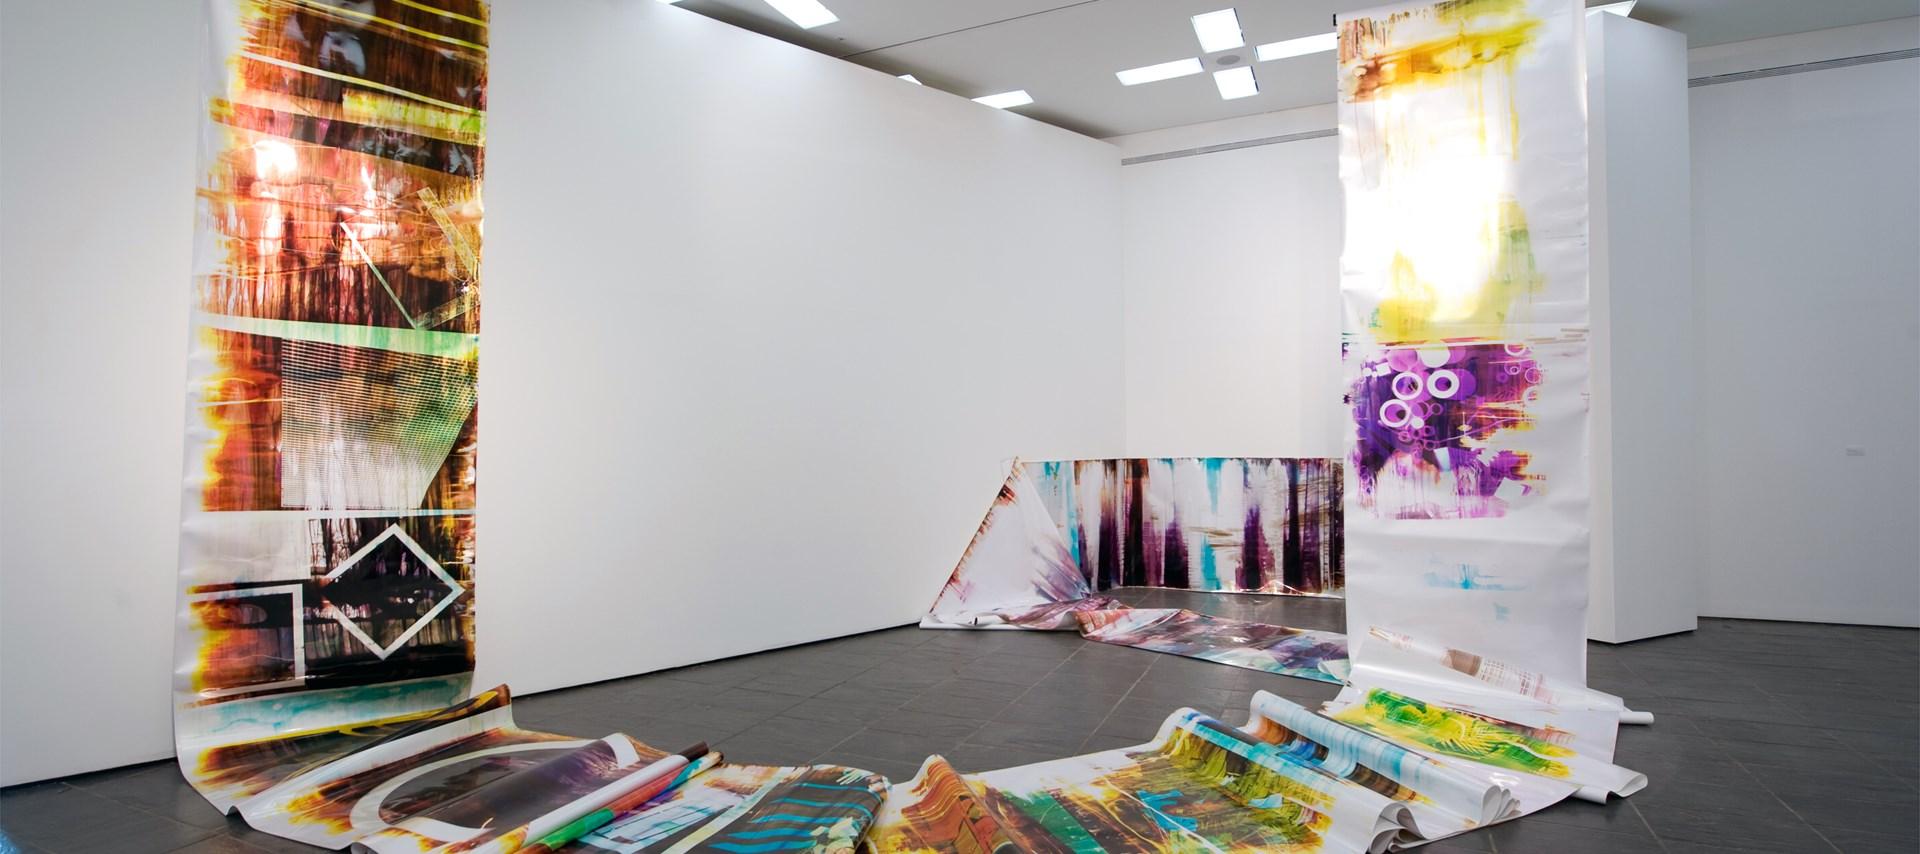 Mariah Robertson: Installation image by Colin Davison